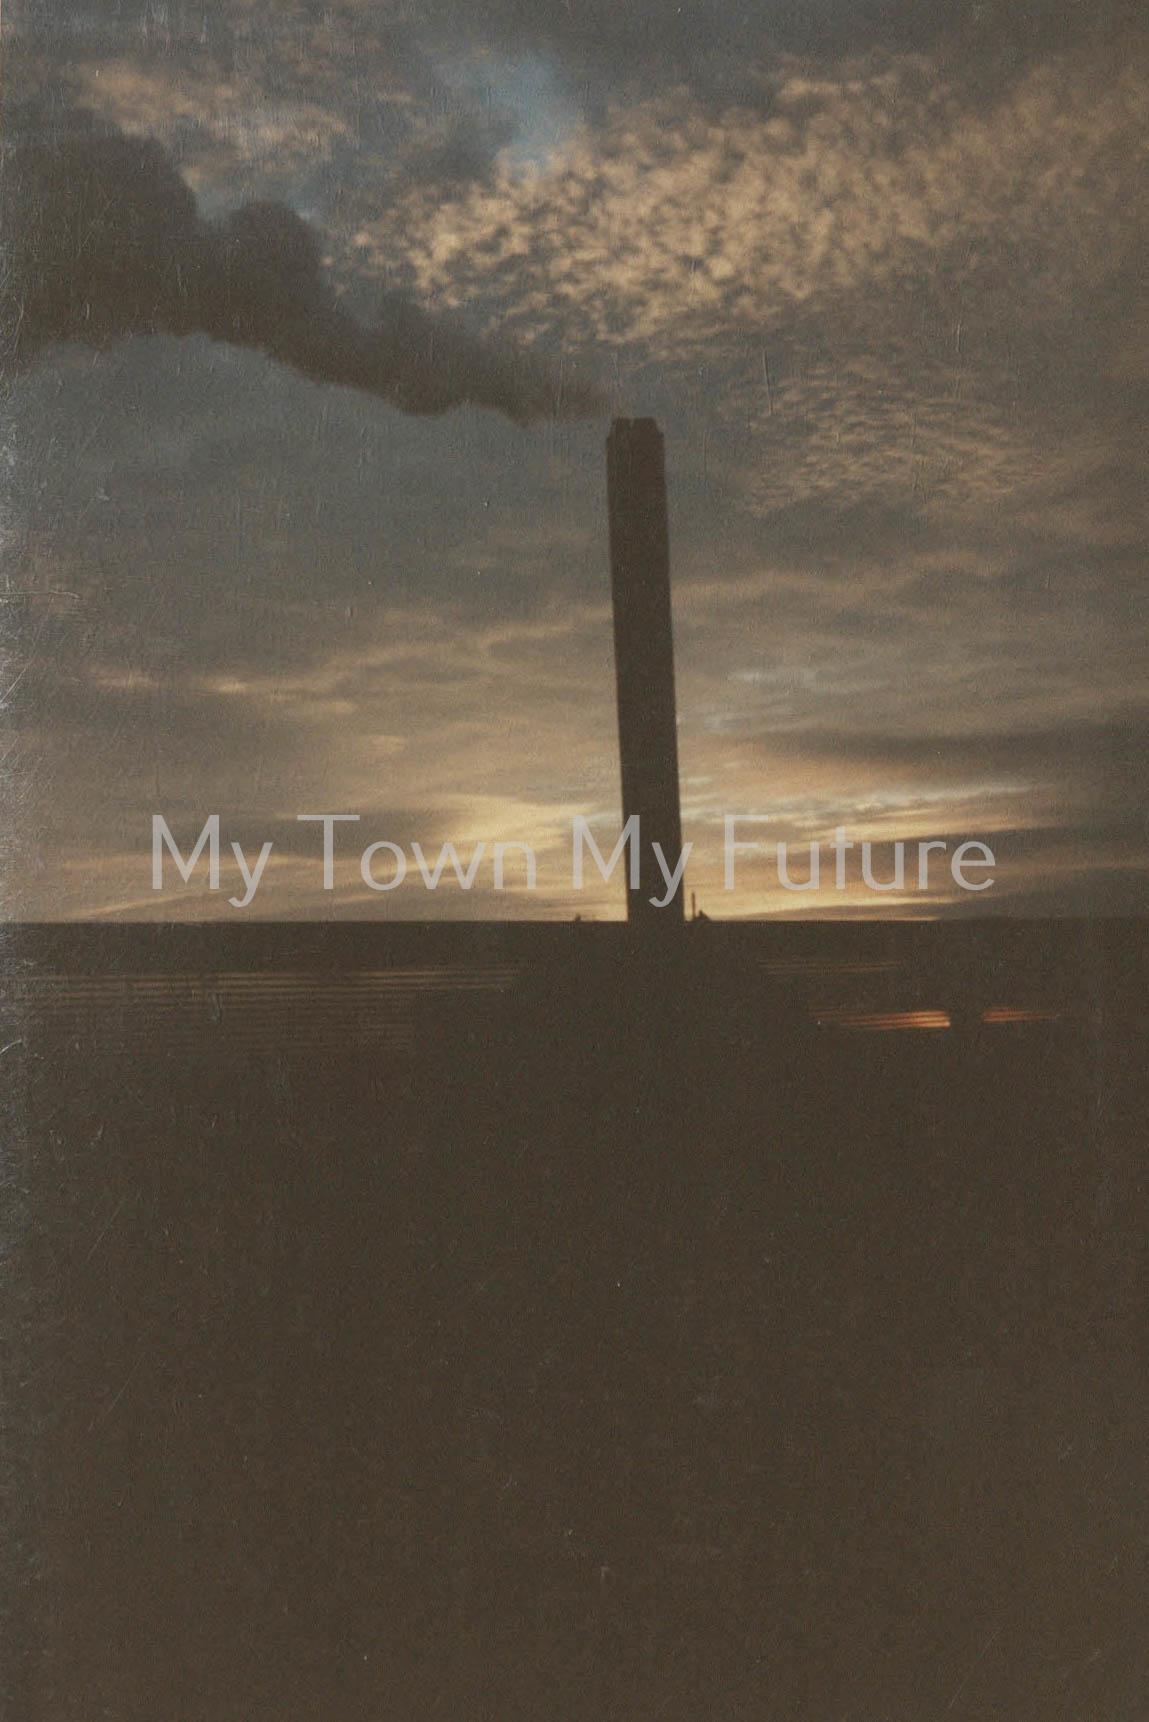 Middlesbrough Incinerator - J Campbell